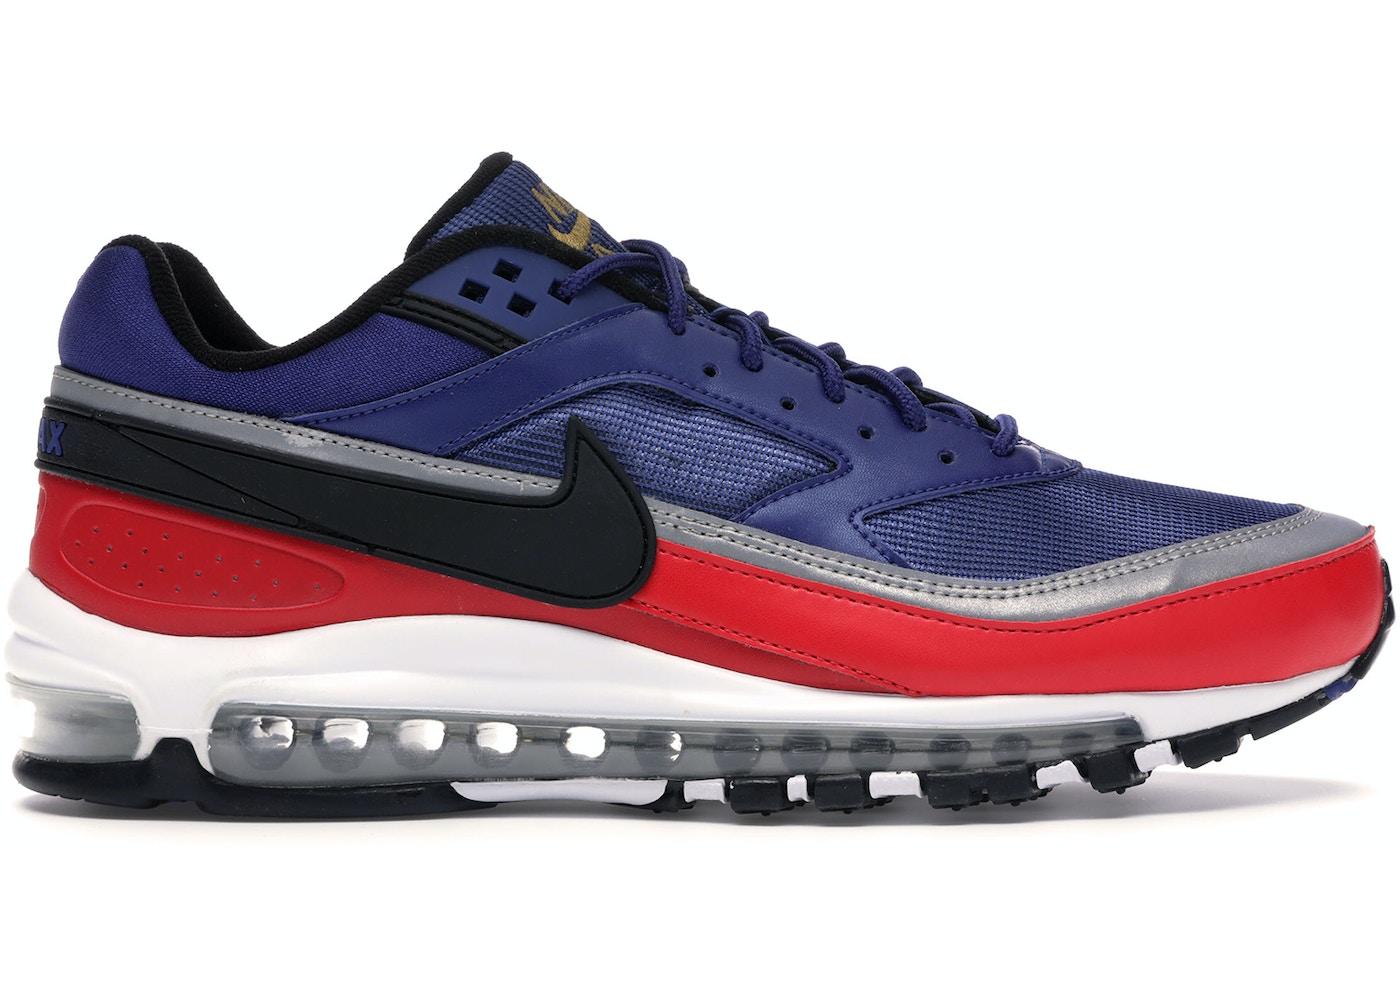 Nike Air Max 97 Bw Deep Royal Blue Black University Red Ao2406 400